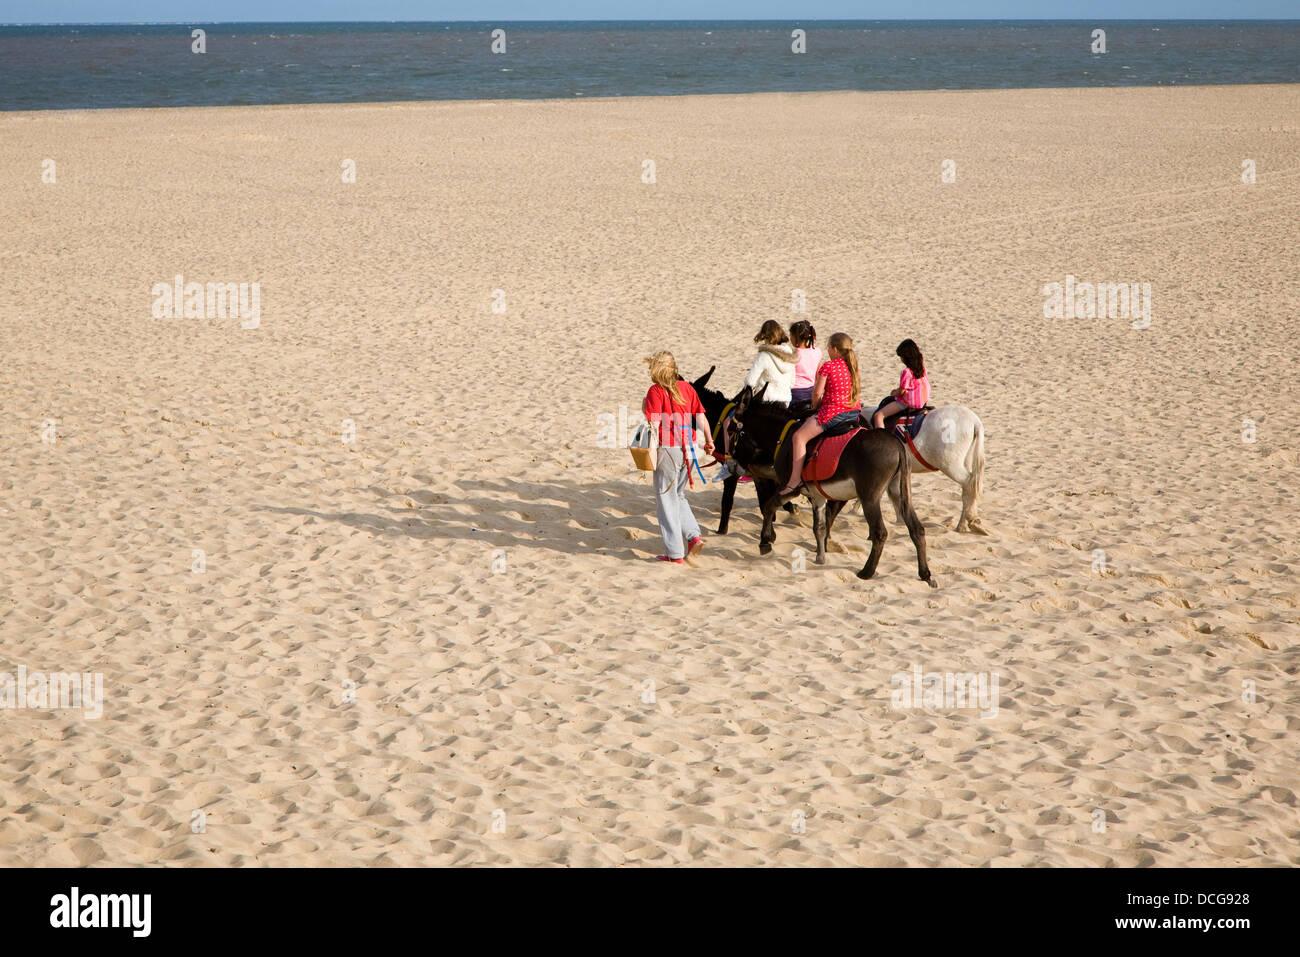 Donkey rides on the beach Great Yarmouth, Norfolk, England Stock Photo